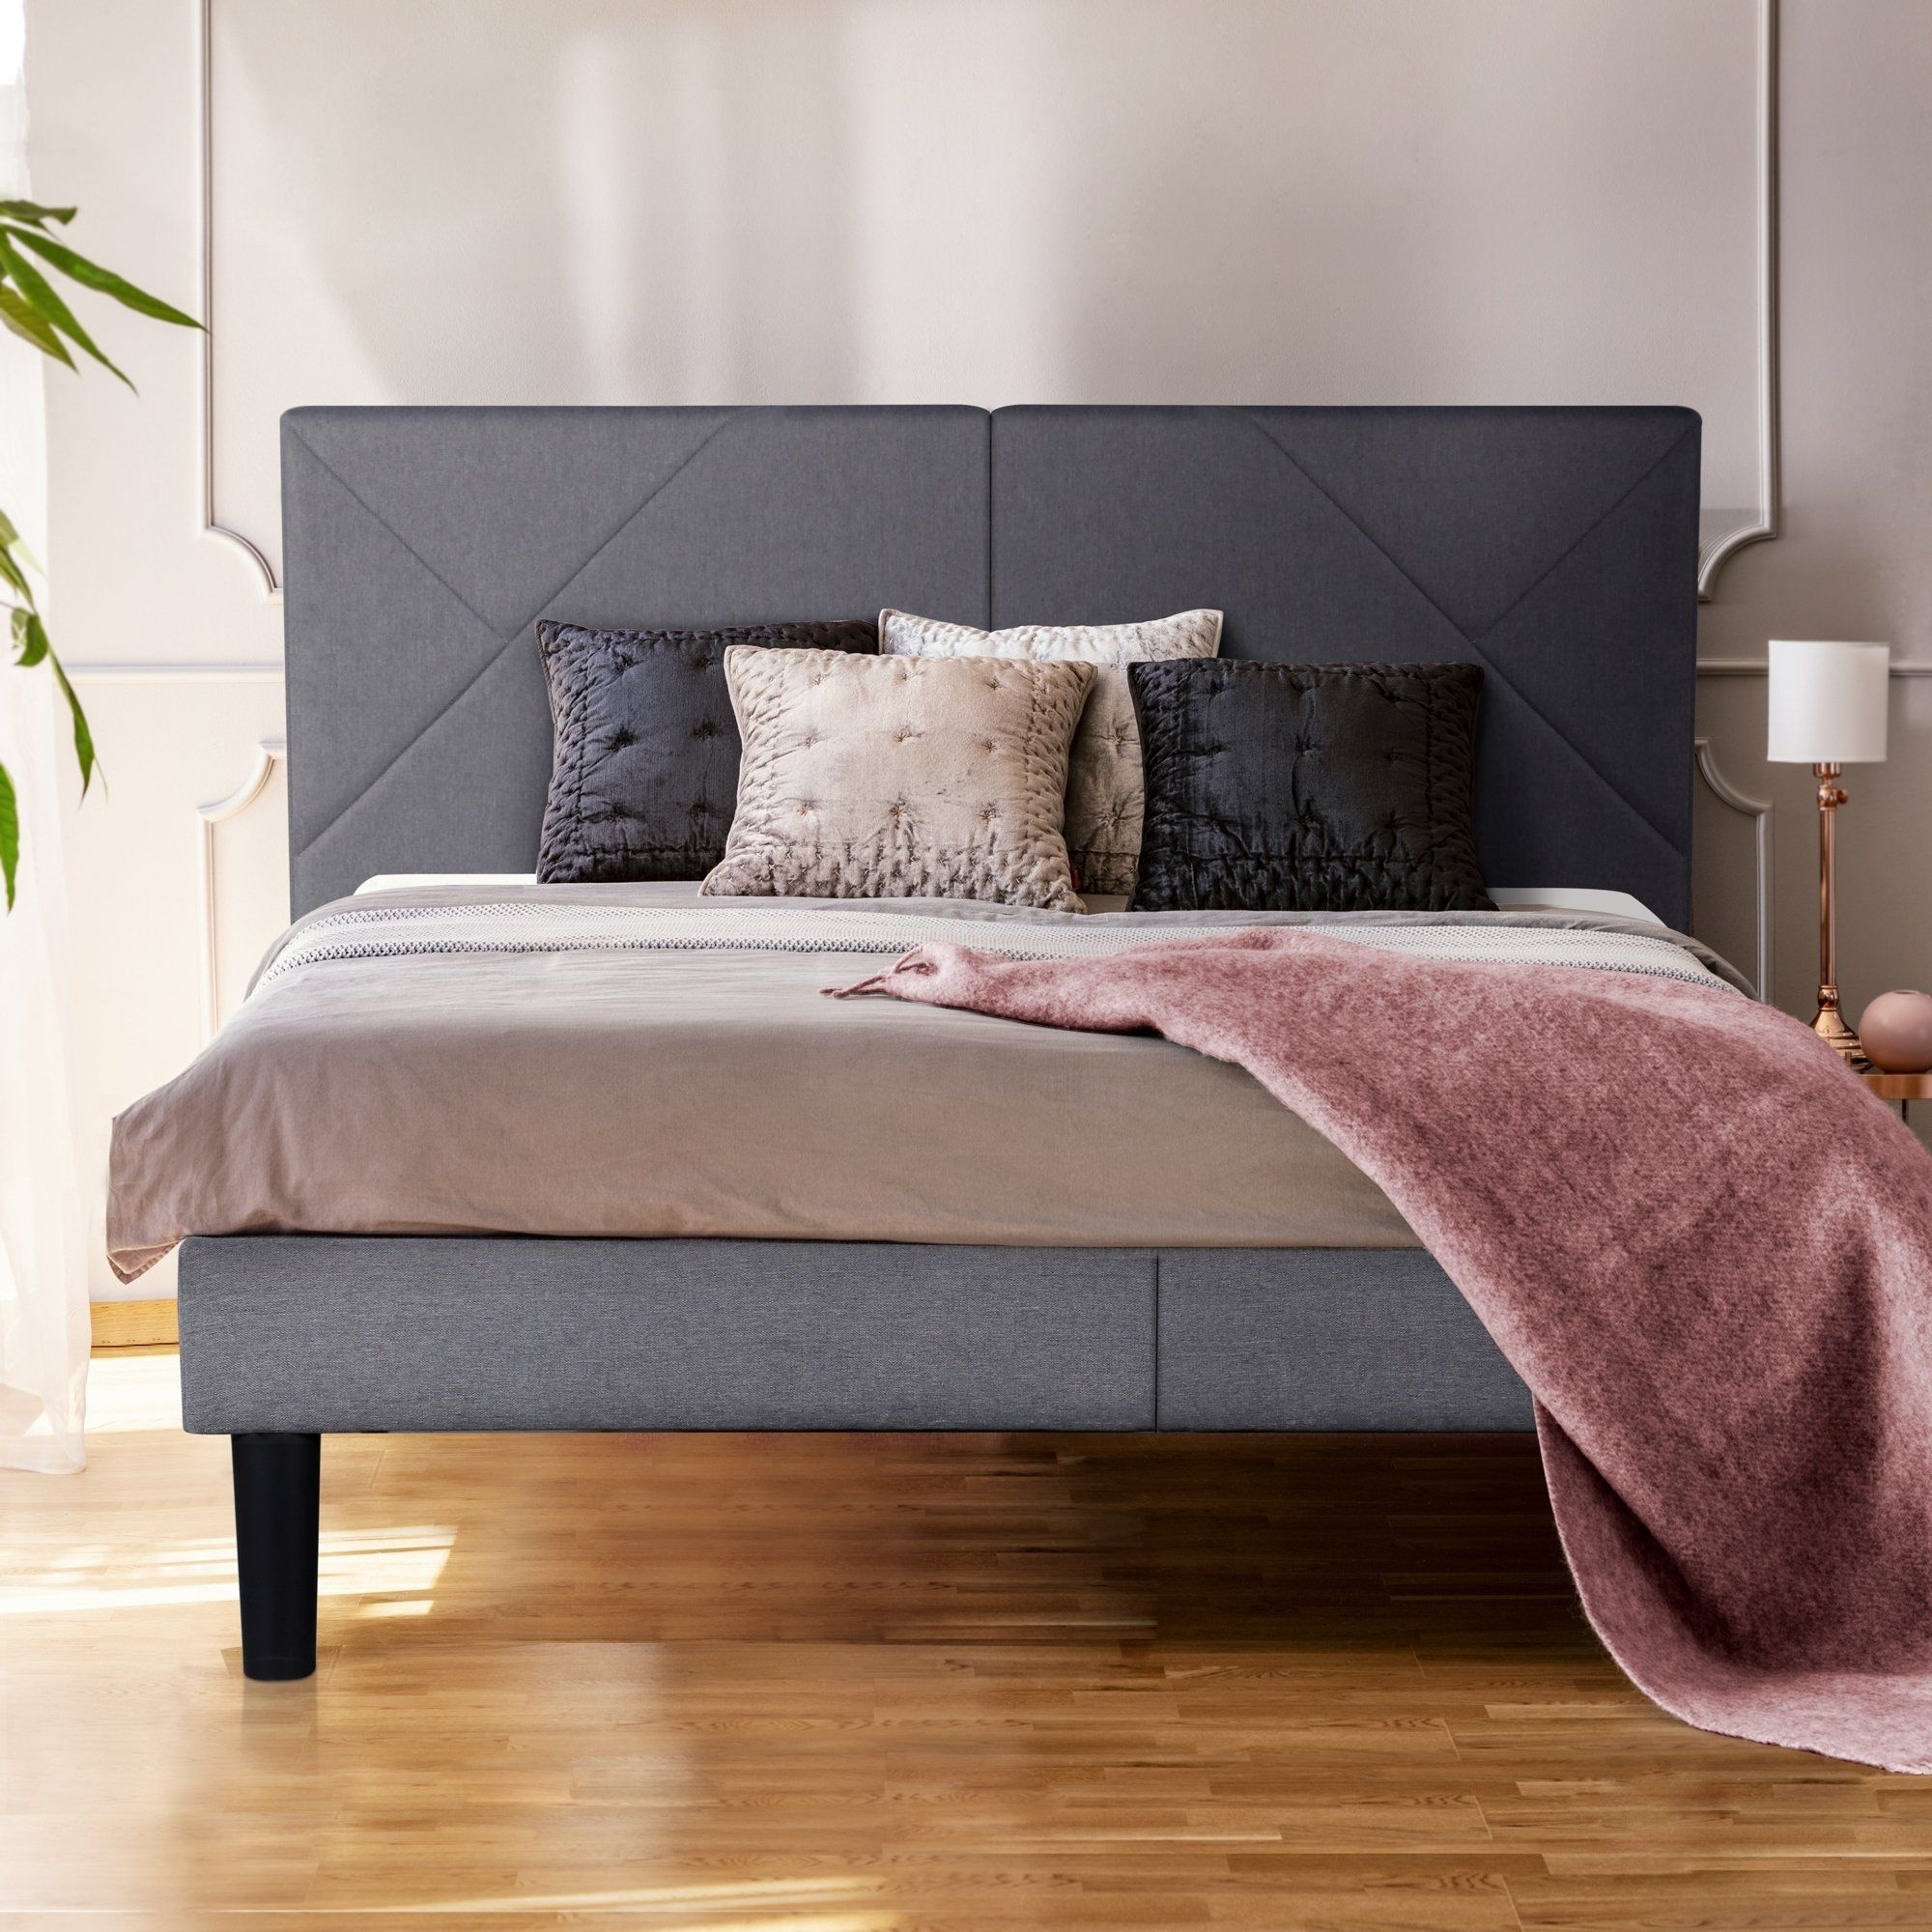 Scandinavian Bed Frame Google Search Upholstered Platform Bed Upholstered Platform Bed King Upholstered Platform Bed Queen